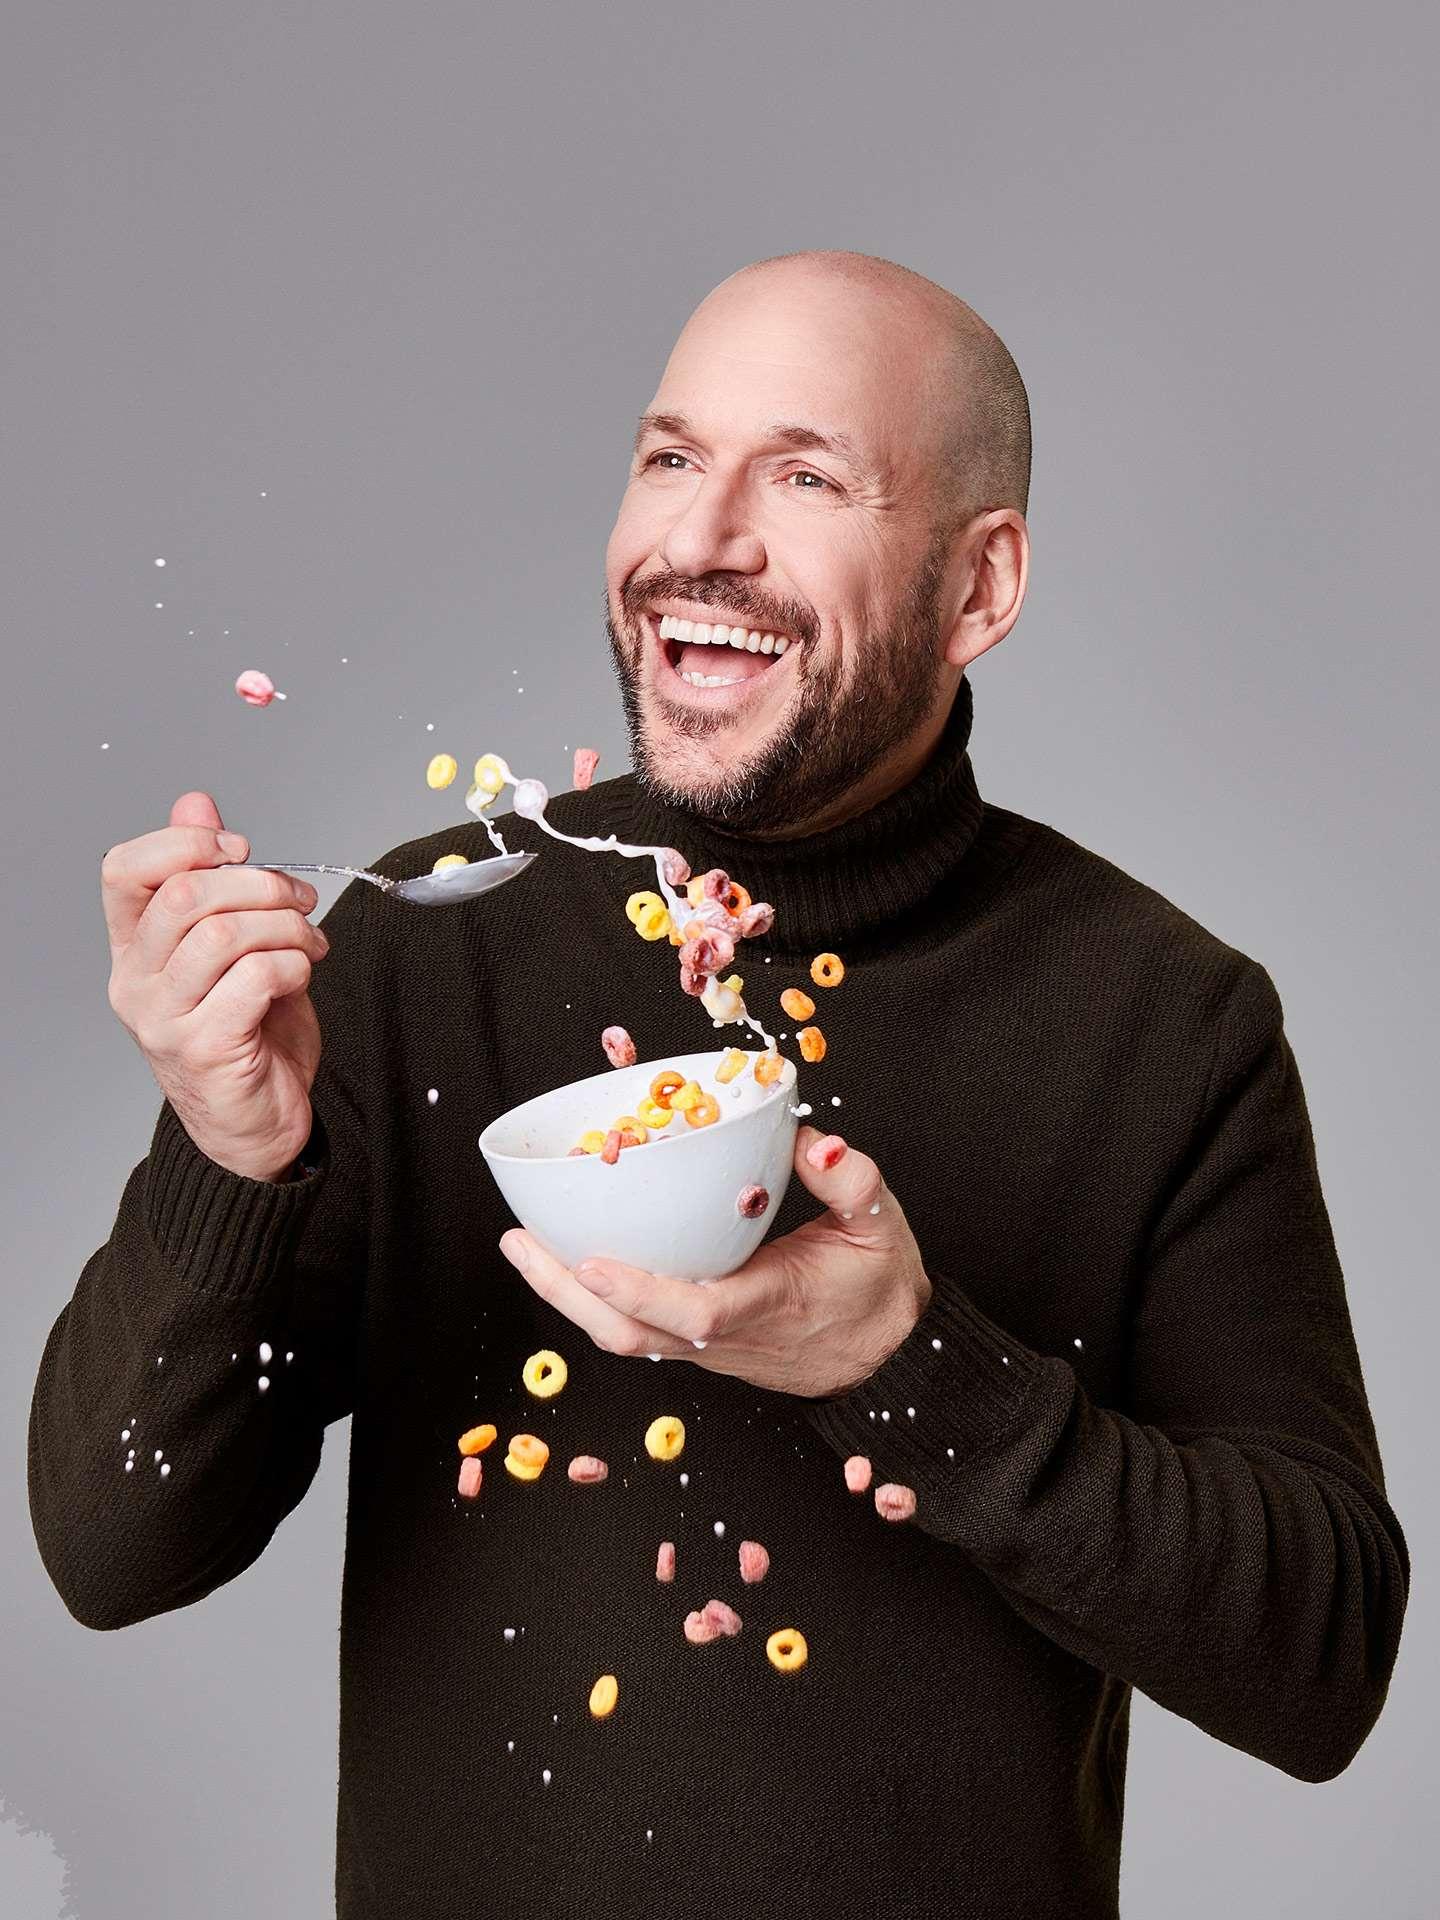 portrait of Martin Matte eating cereal sploshing around by Jocelyn Michel for Journal de Montréal